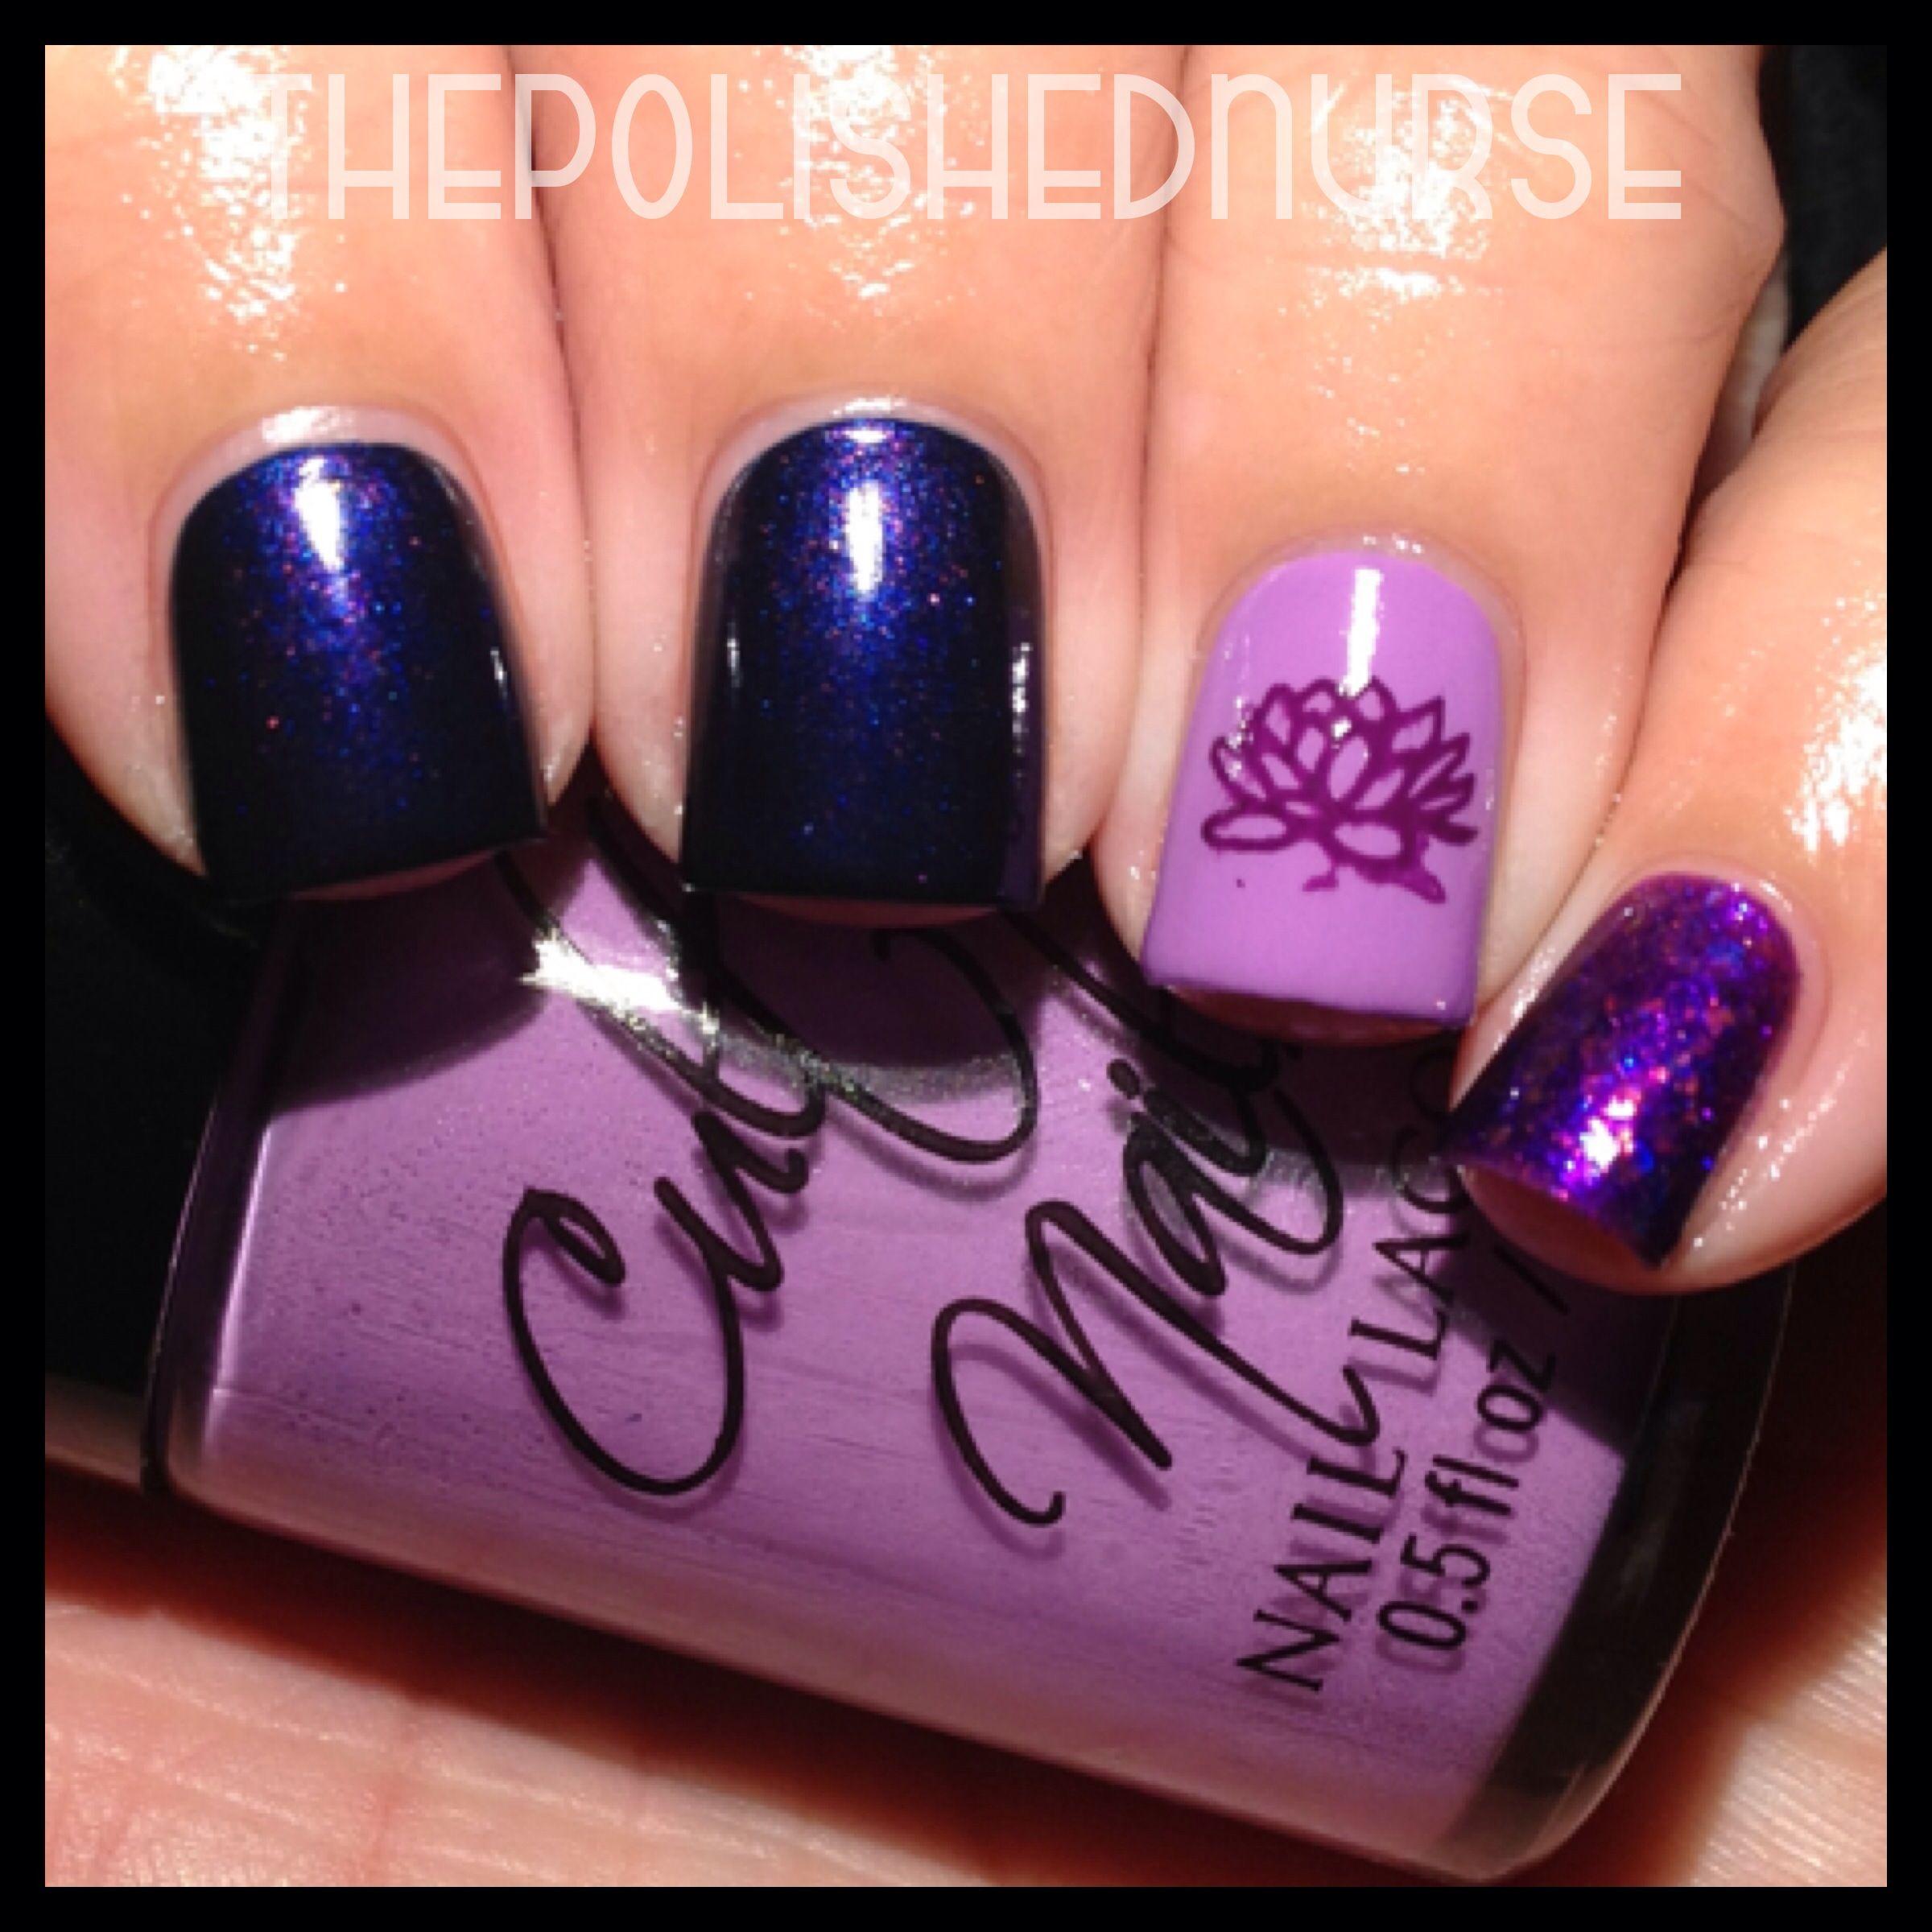 Lotus flower purple nail art thepolishednurse nailart nails lotus flower purple nail art thepolishednurse nailart nails instagram thepolishednurse dhlflorist Image collections